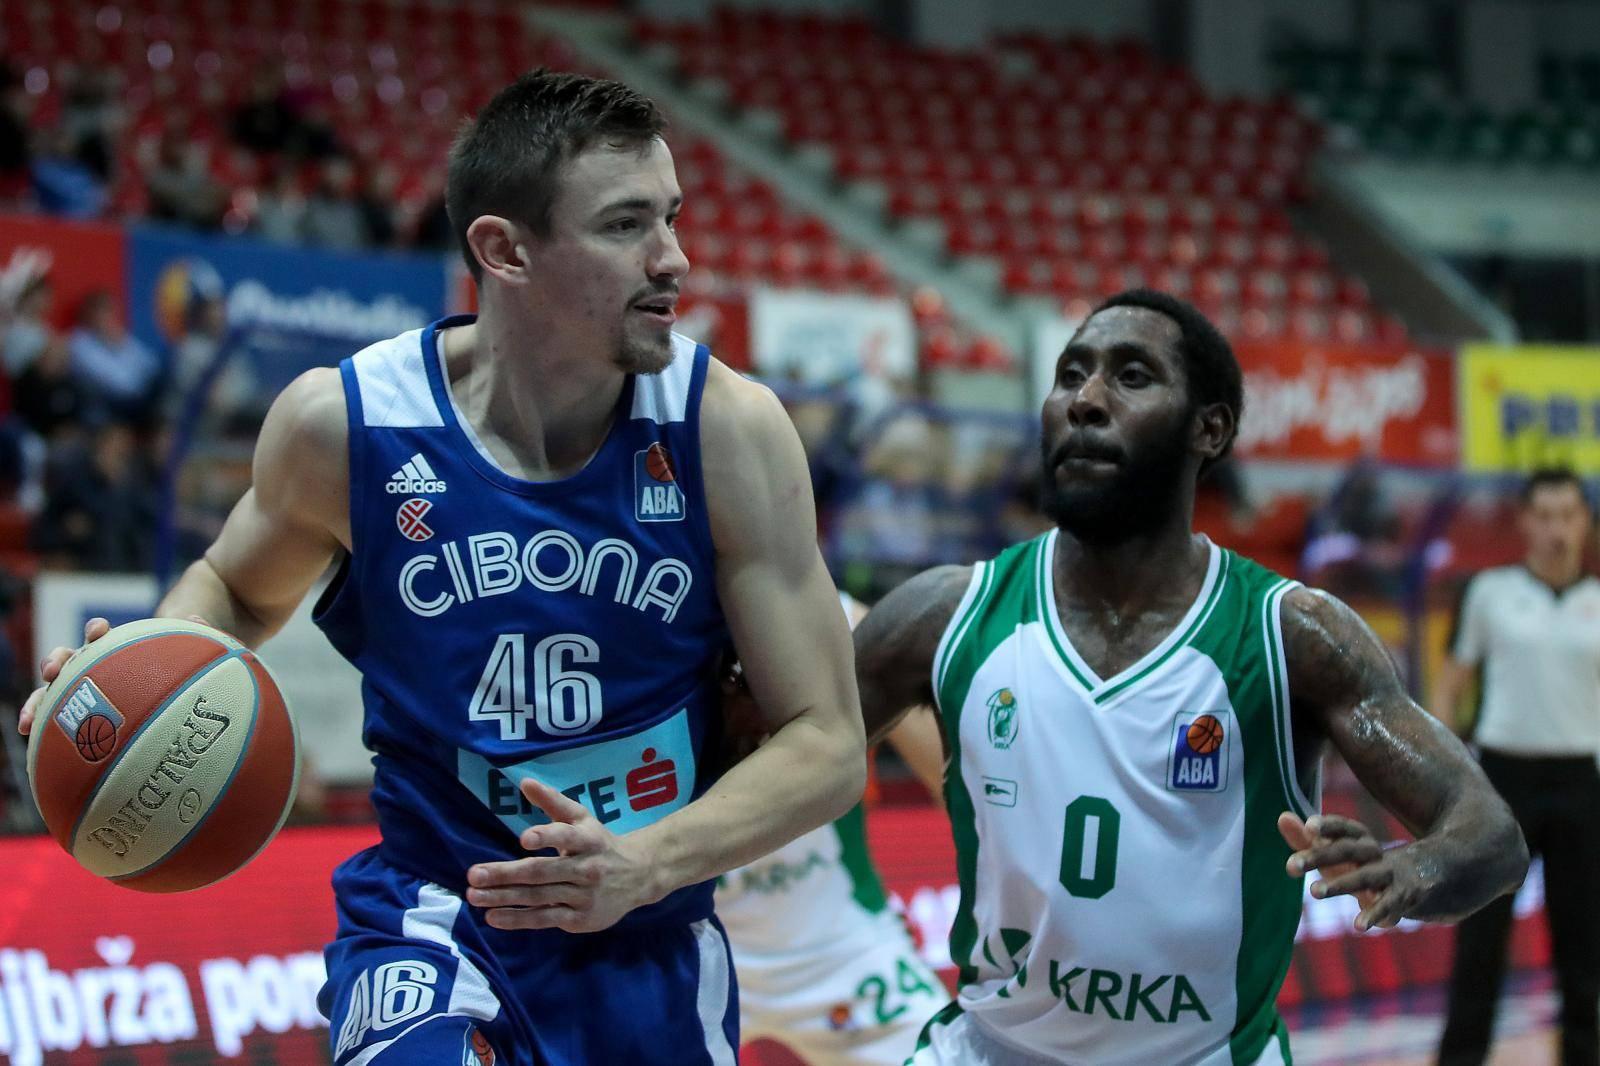 Zagreb: U ABA ligi susreli se KK Cibona i KK Krka